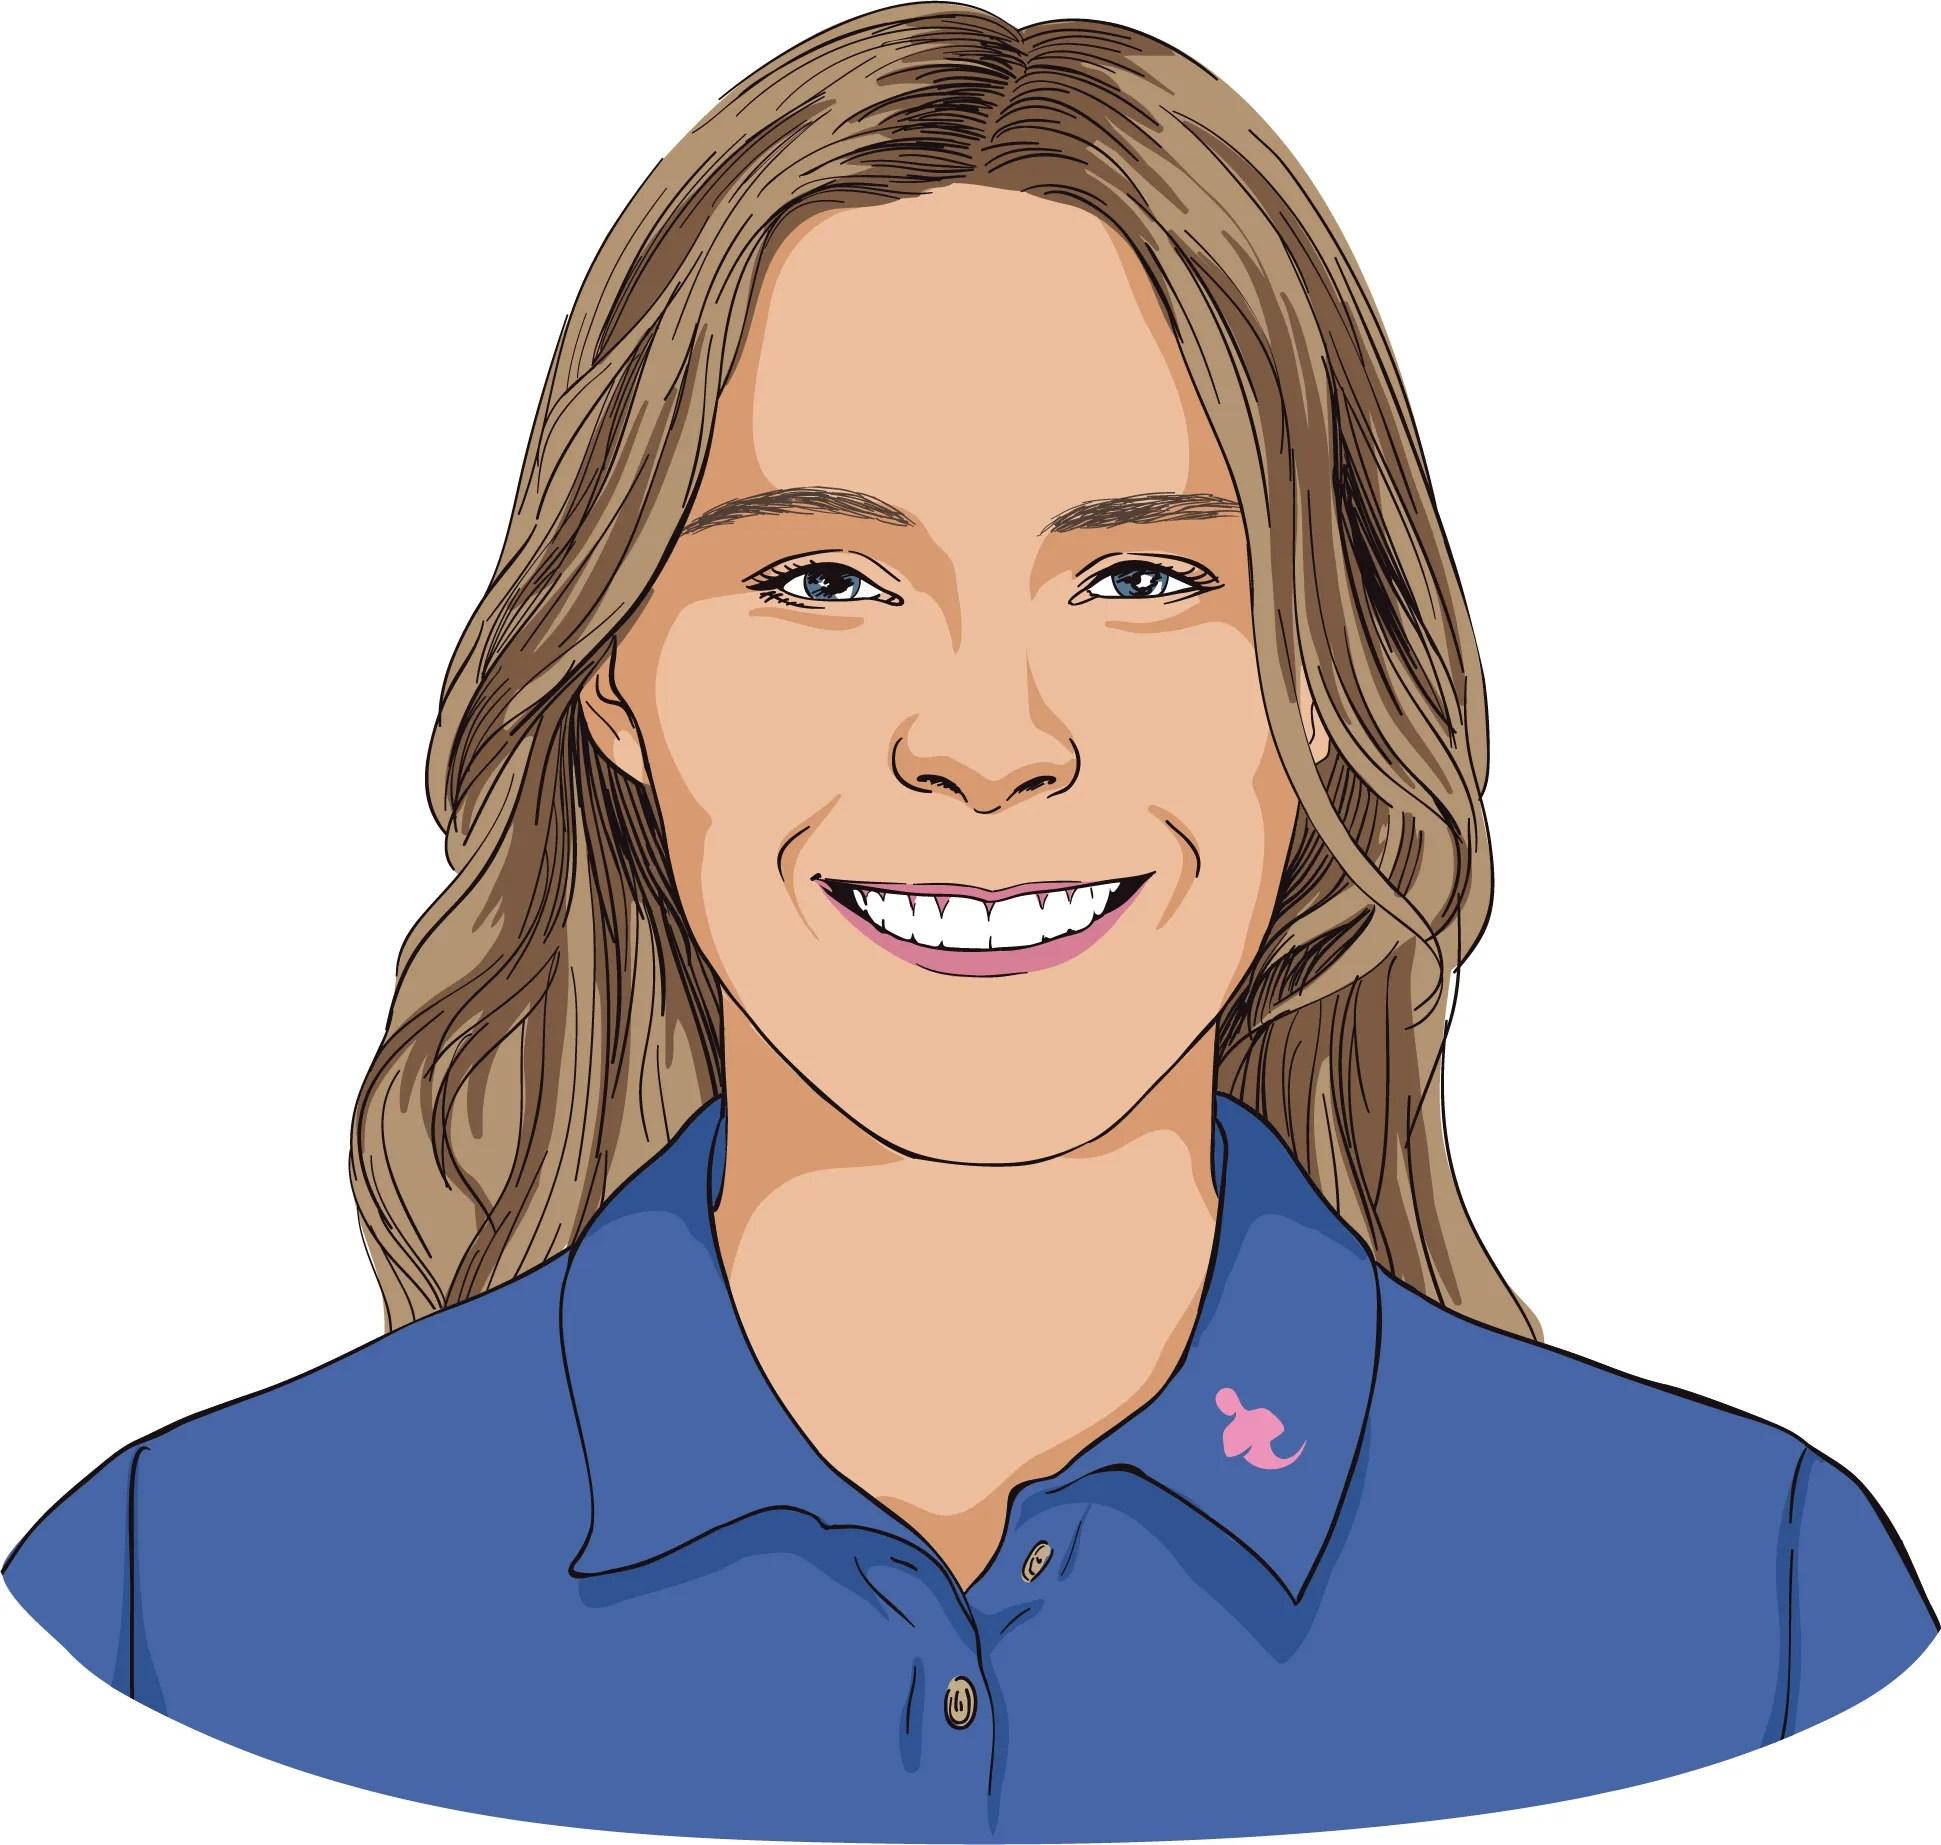 Sarah Chrisp, founder of Wholesale Ted